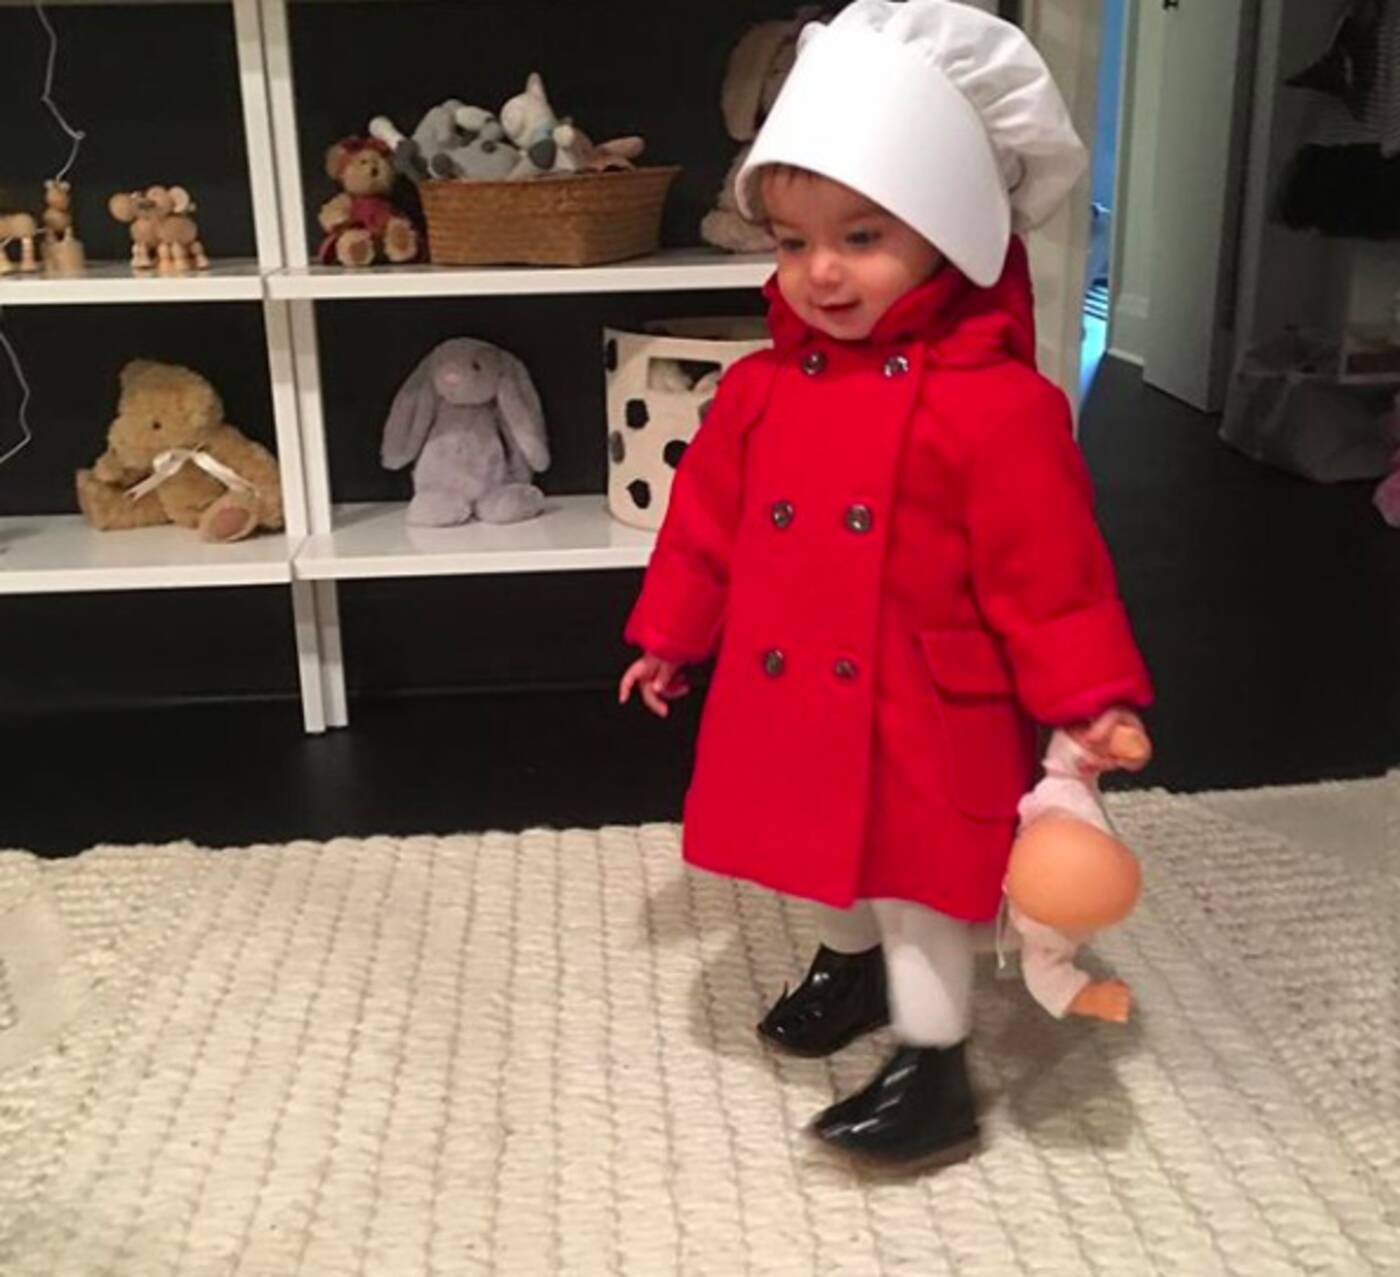 handmaids tale baby costume